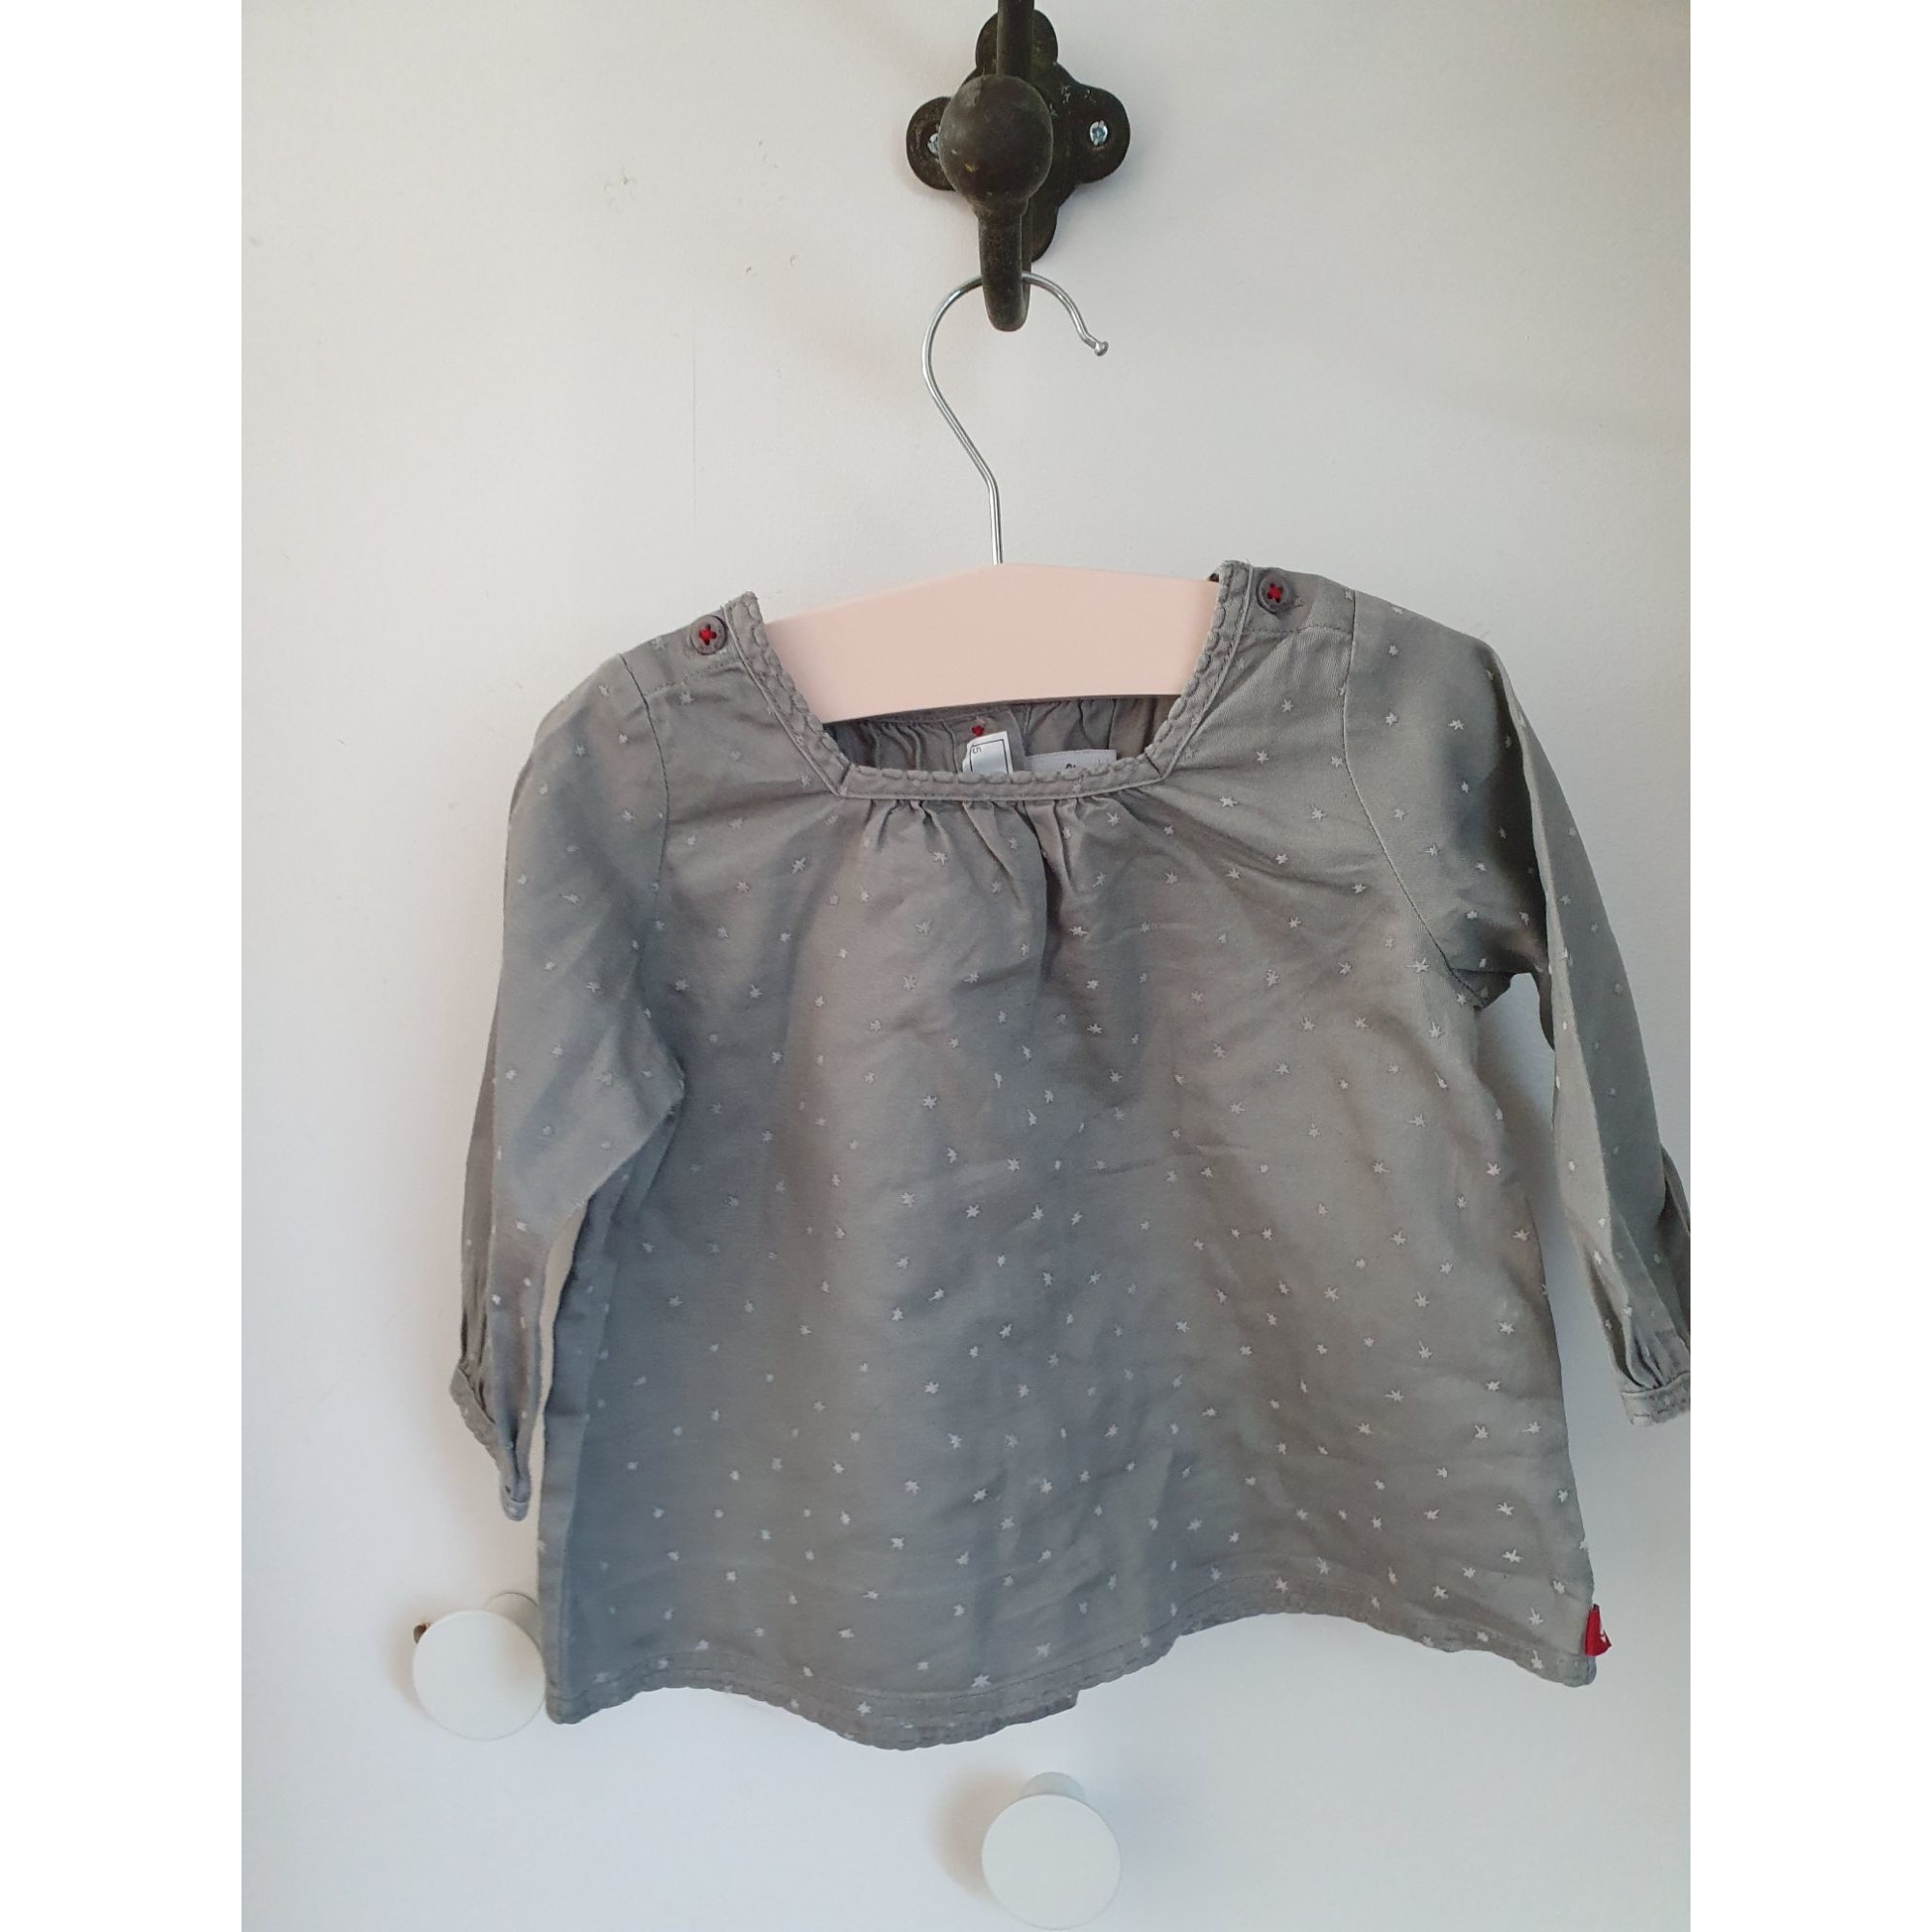 Chemisier, chemisette PETIT BATEAU Gris, anthracite